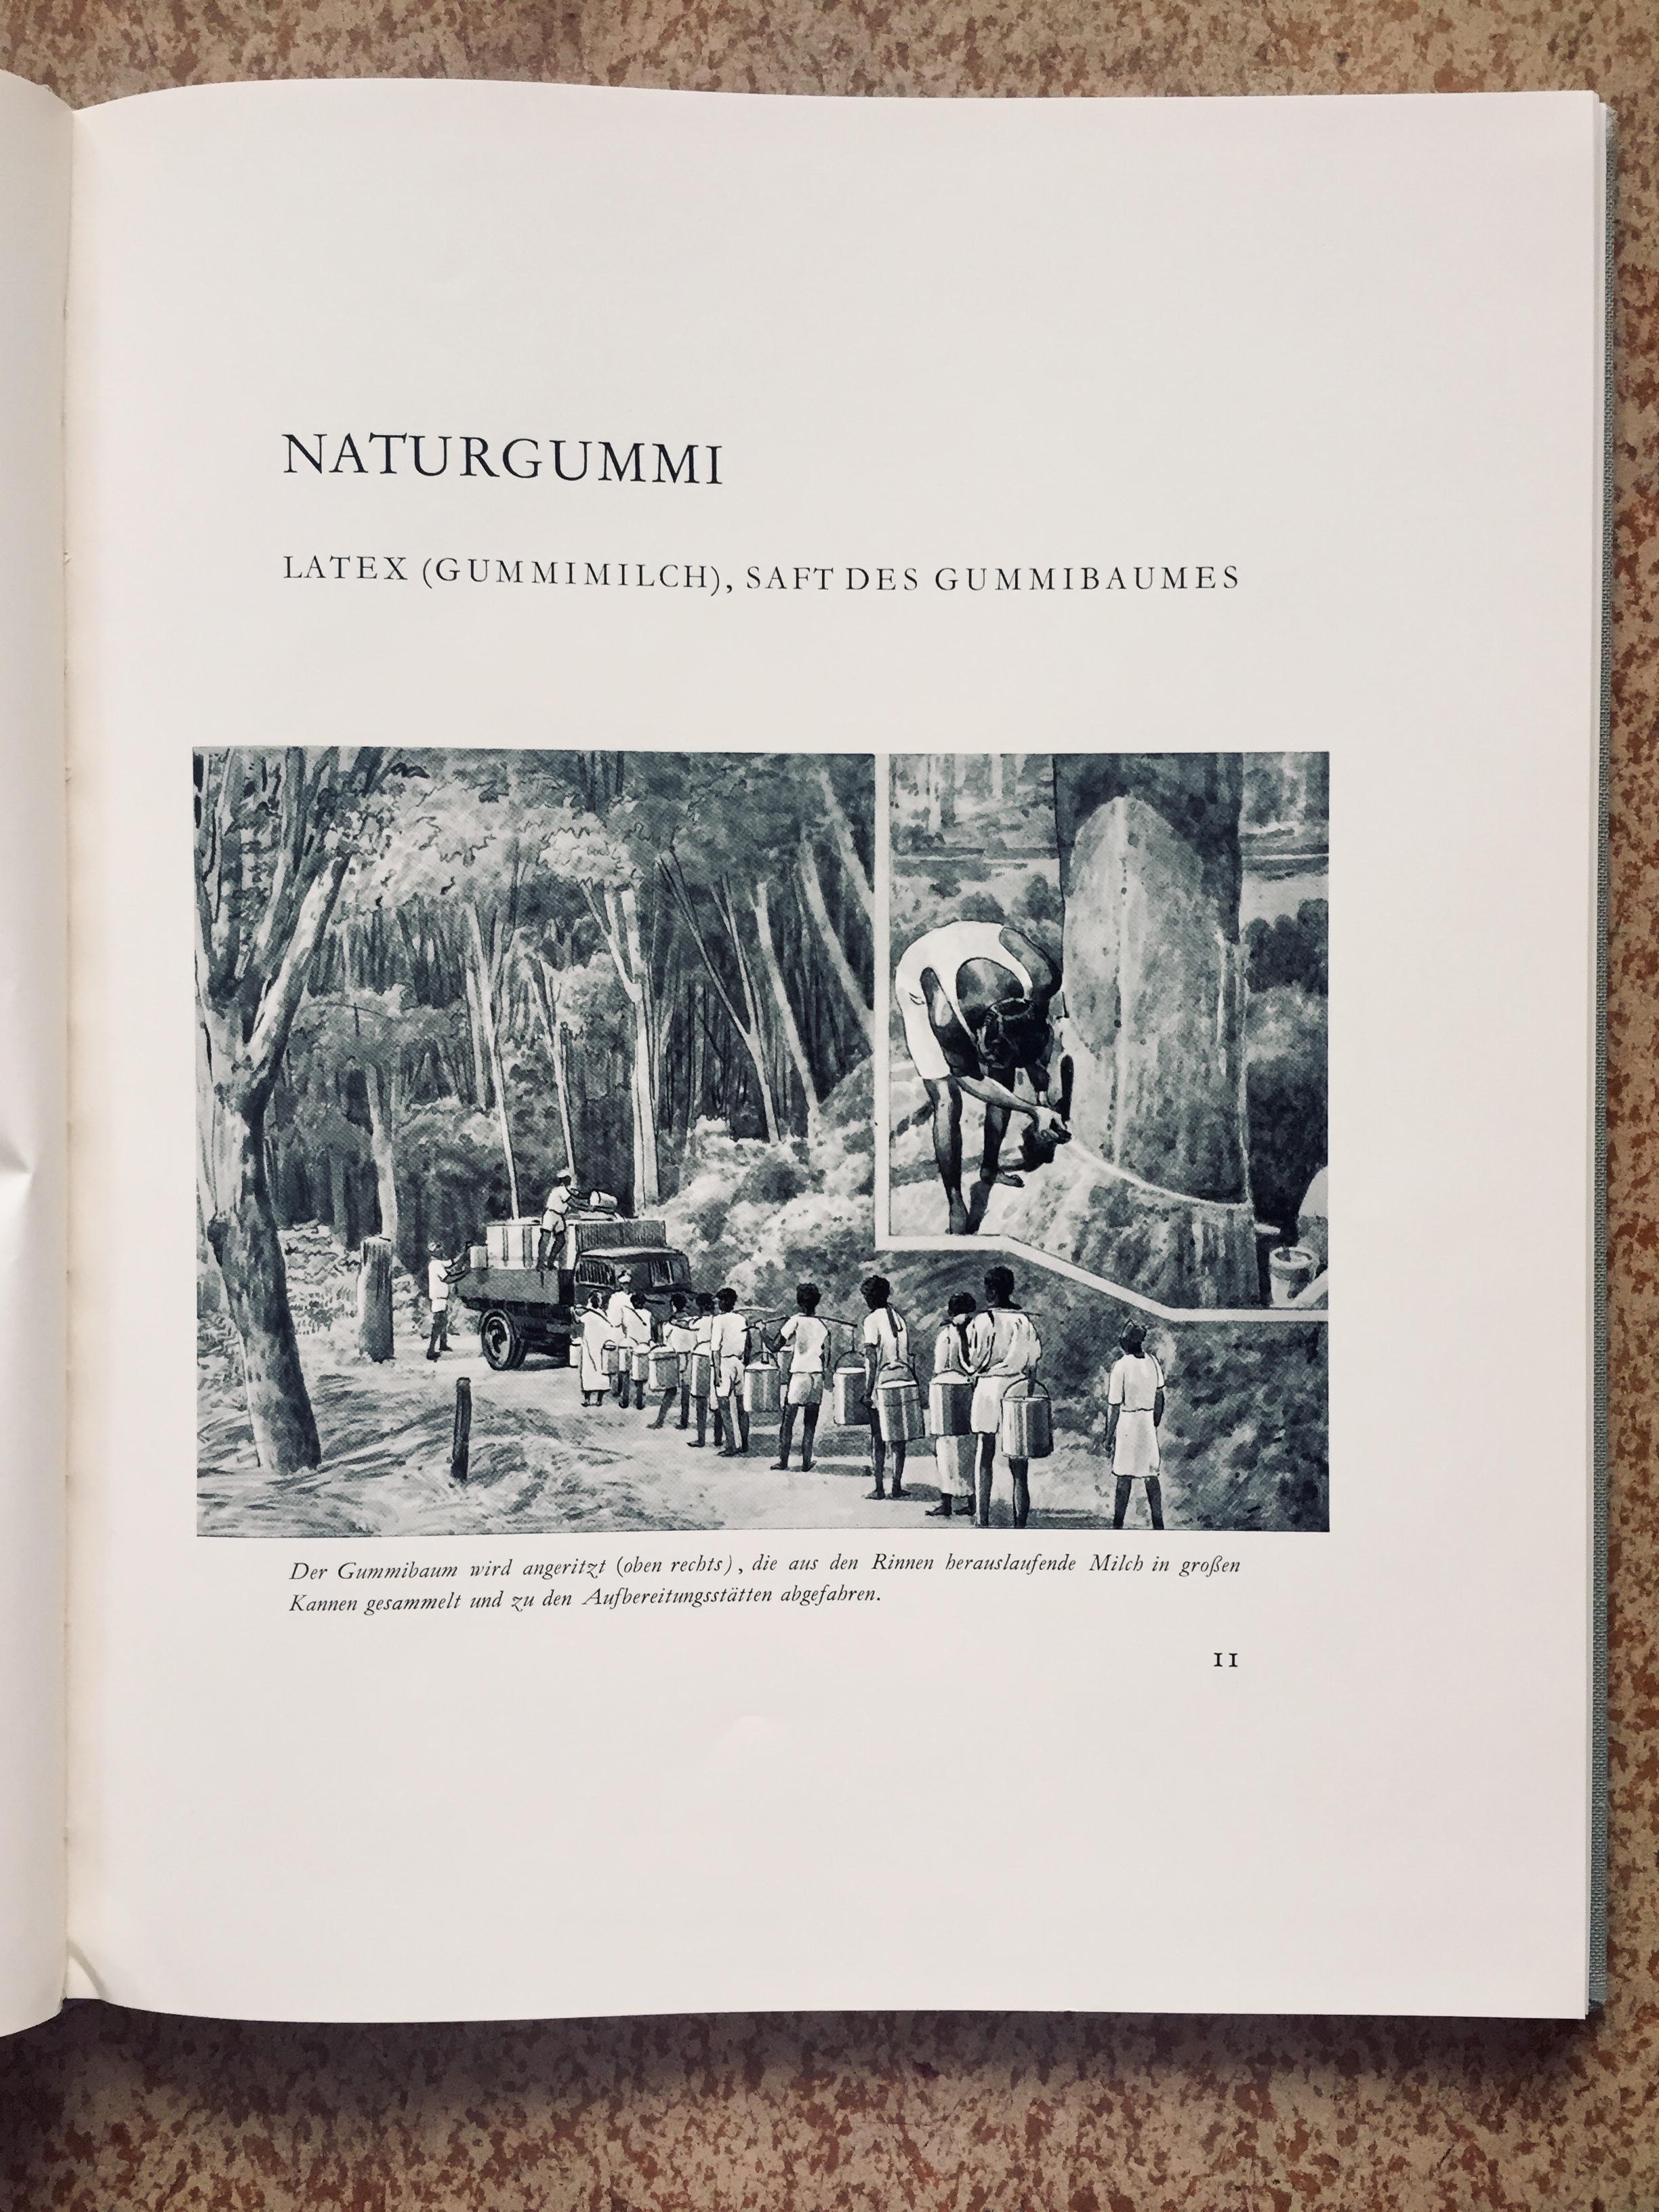 Festschrift illustration of workers on a rubber plantation, 1957